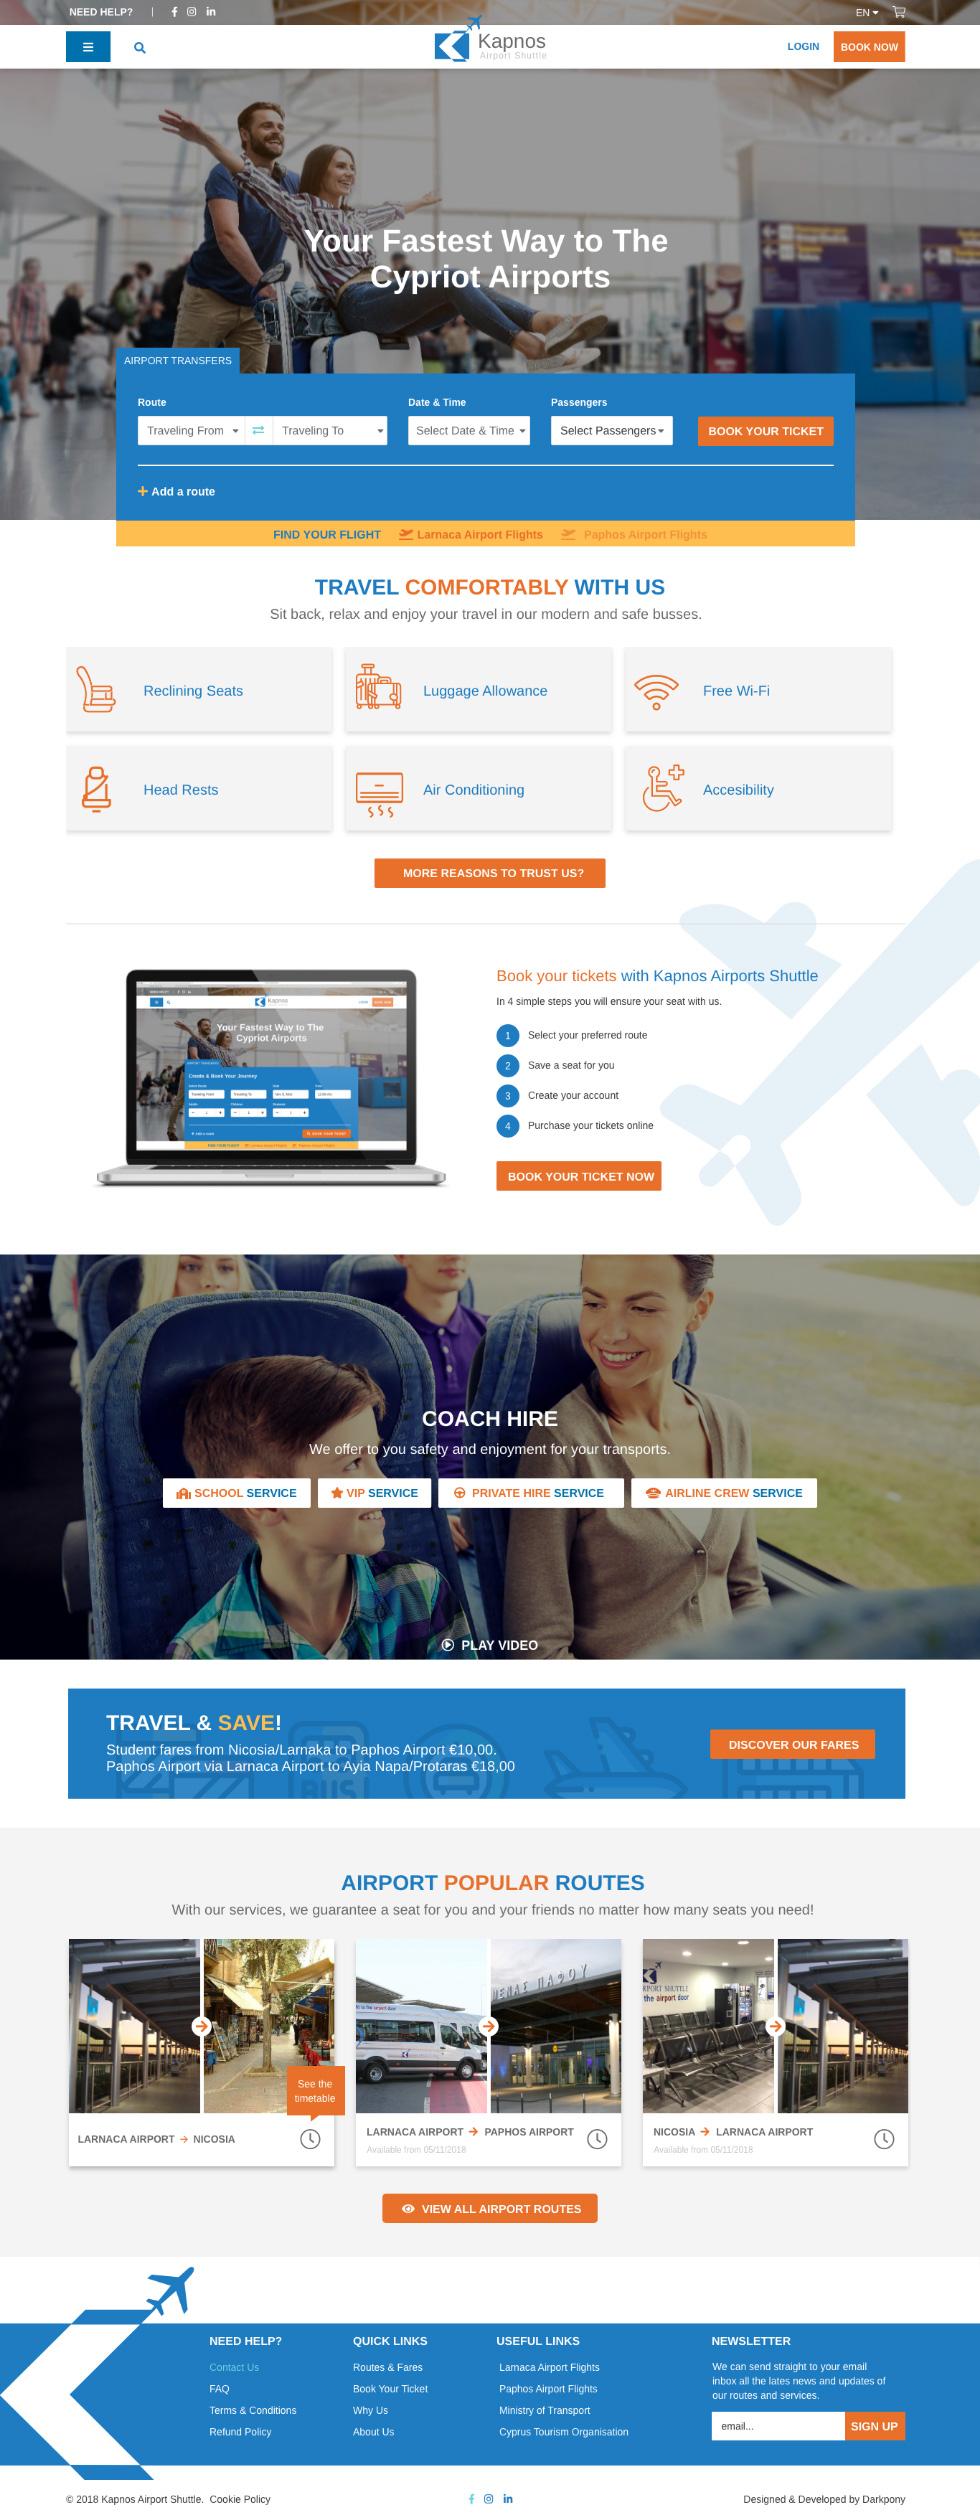 Dp-WebContent-Kapnos-Website